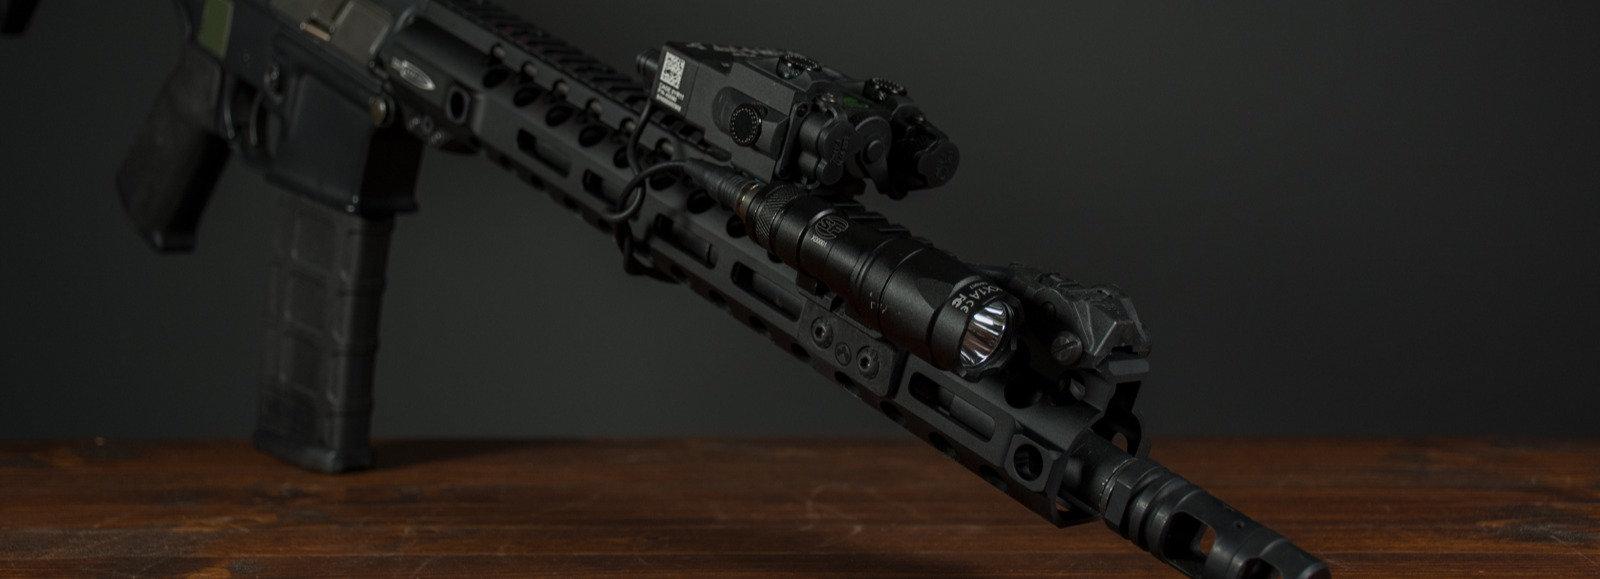 Centurion_Arms_CMR_Rail_M-LOK_10_edited.